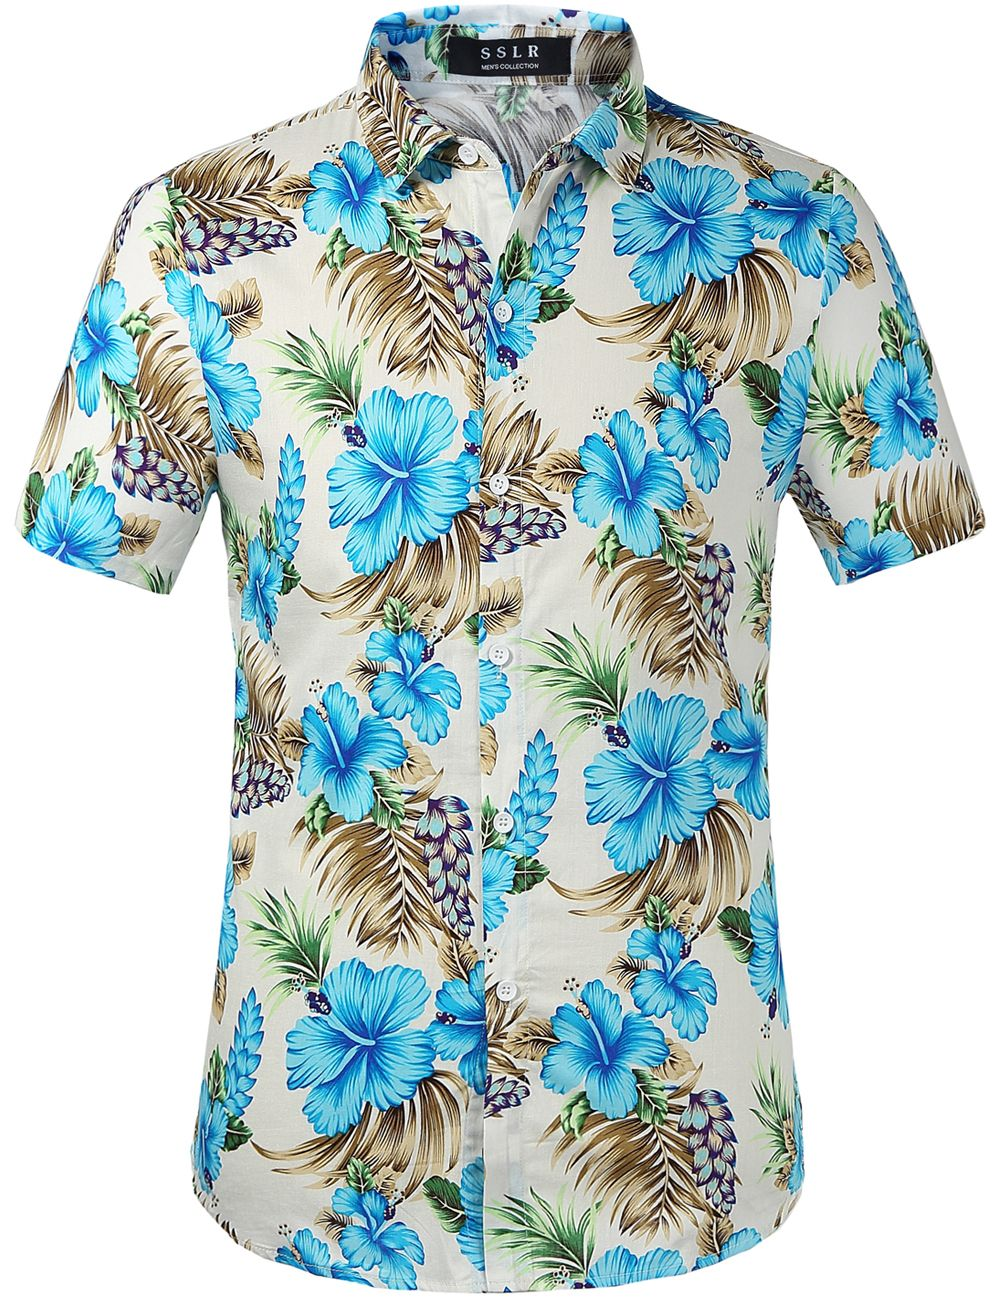 SSLR Mens Parrots Leaves Button Down Casual Short Sleeve Hawaiian Shirt